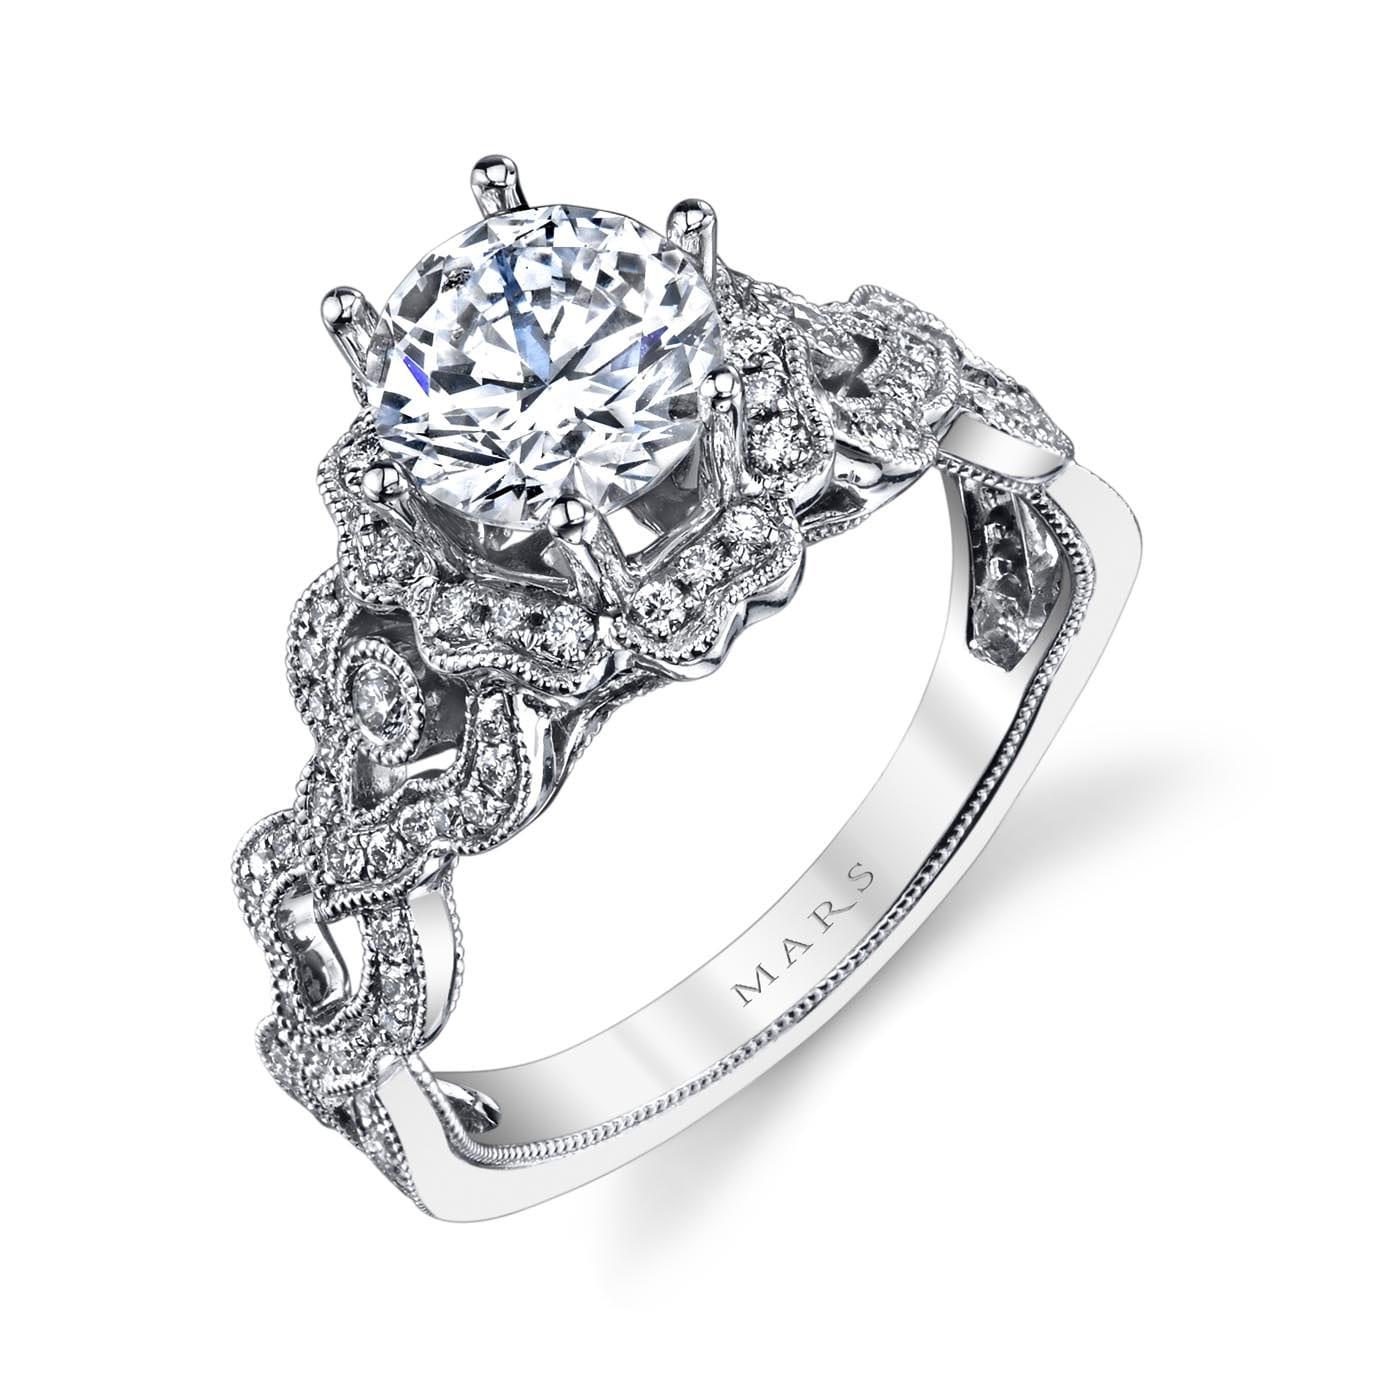 Halo Engagement RingStyle #: MARS 26593